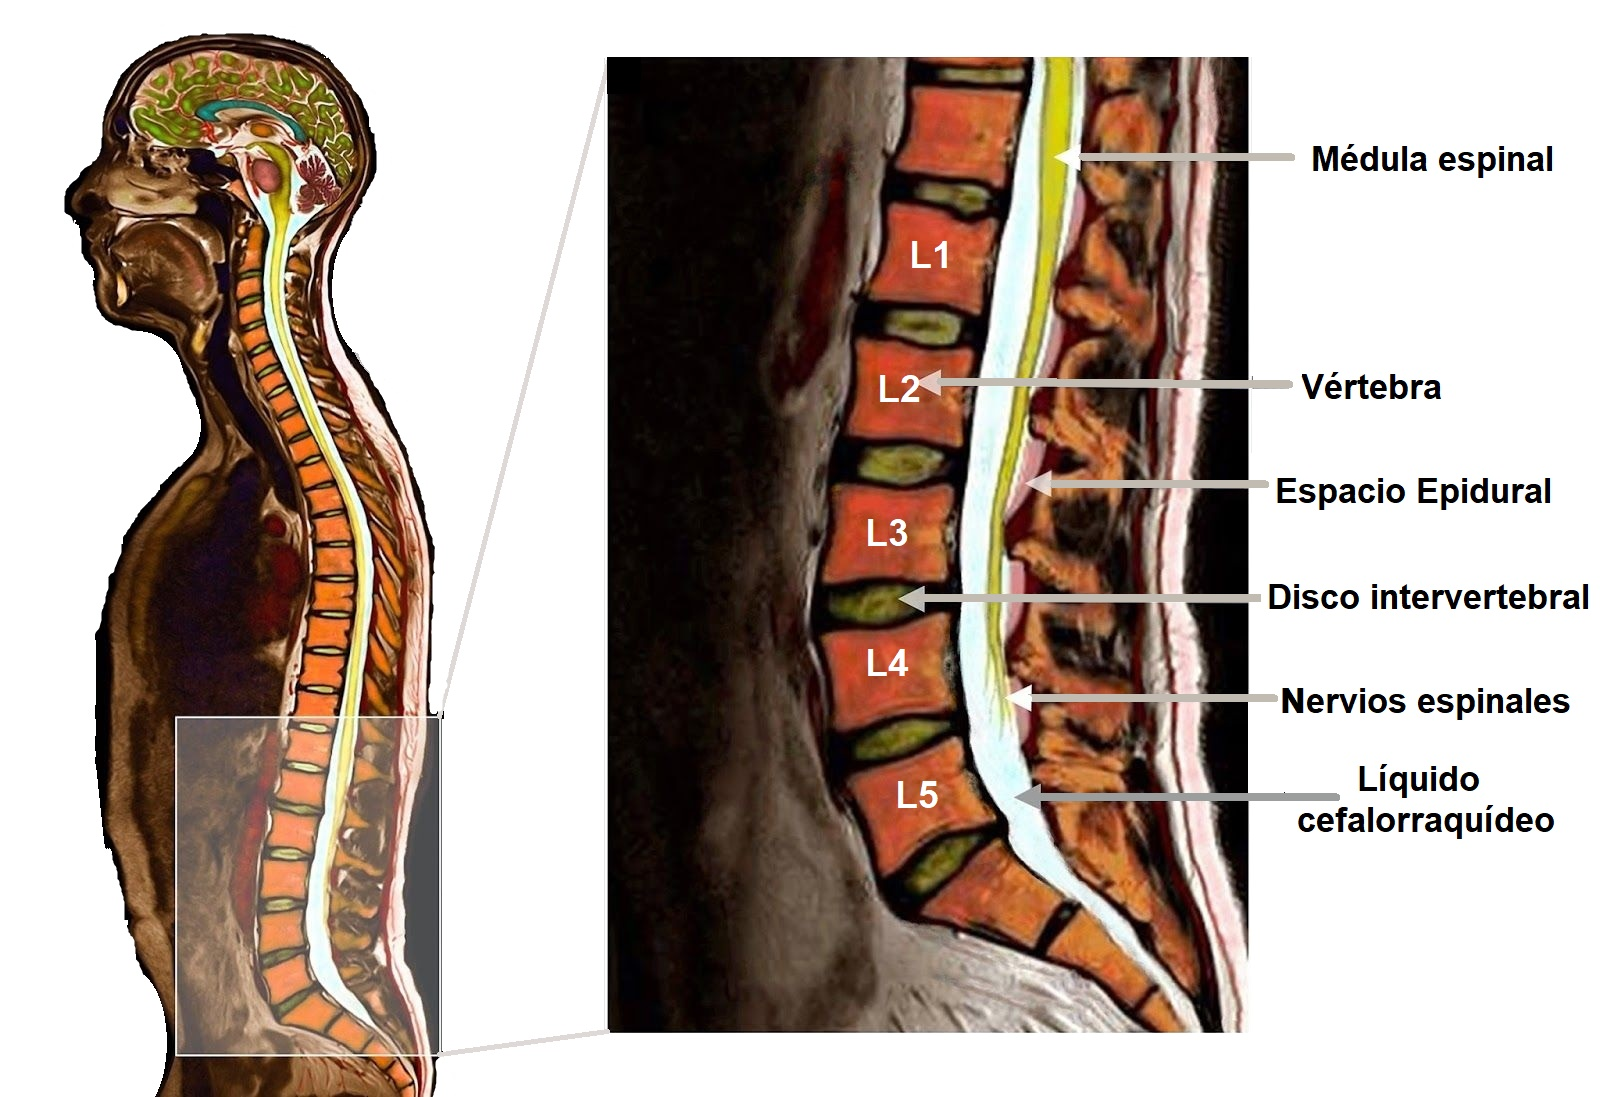 anatomía de la columna lumbar